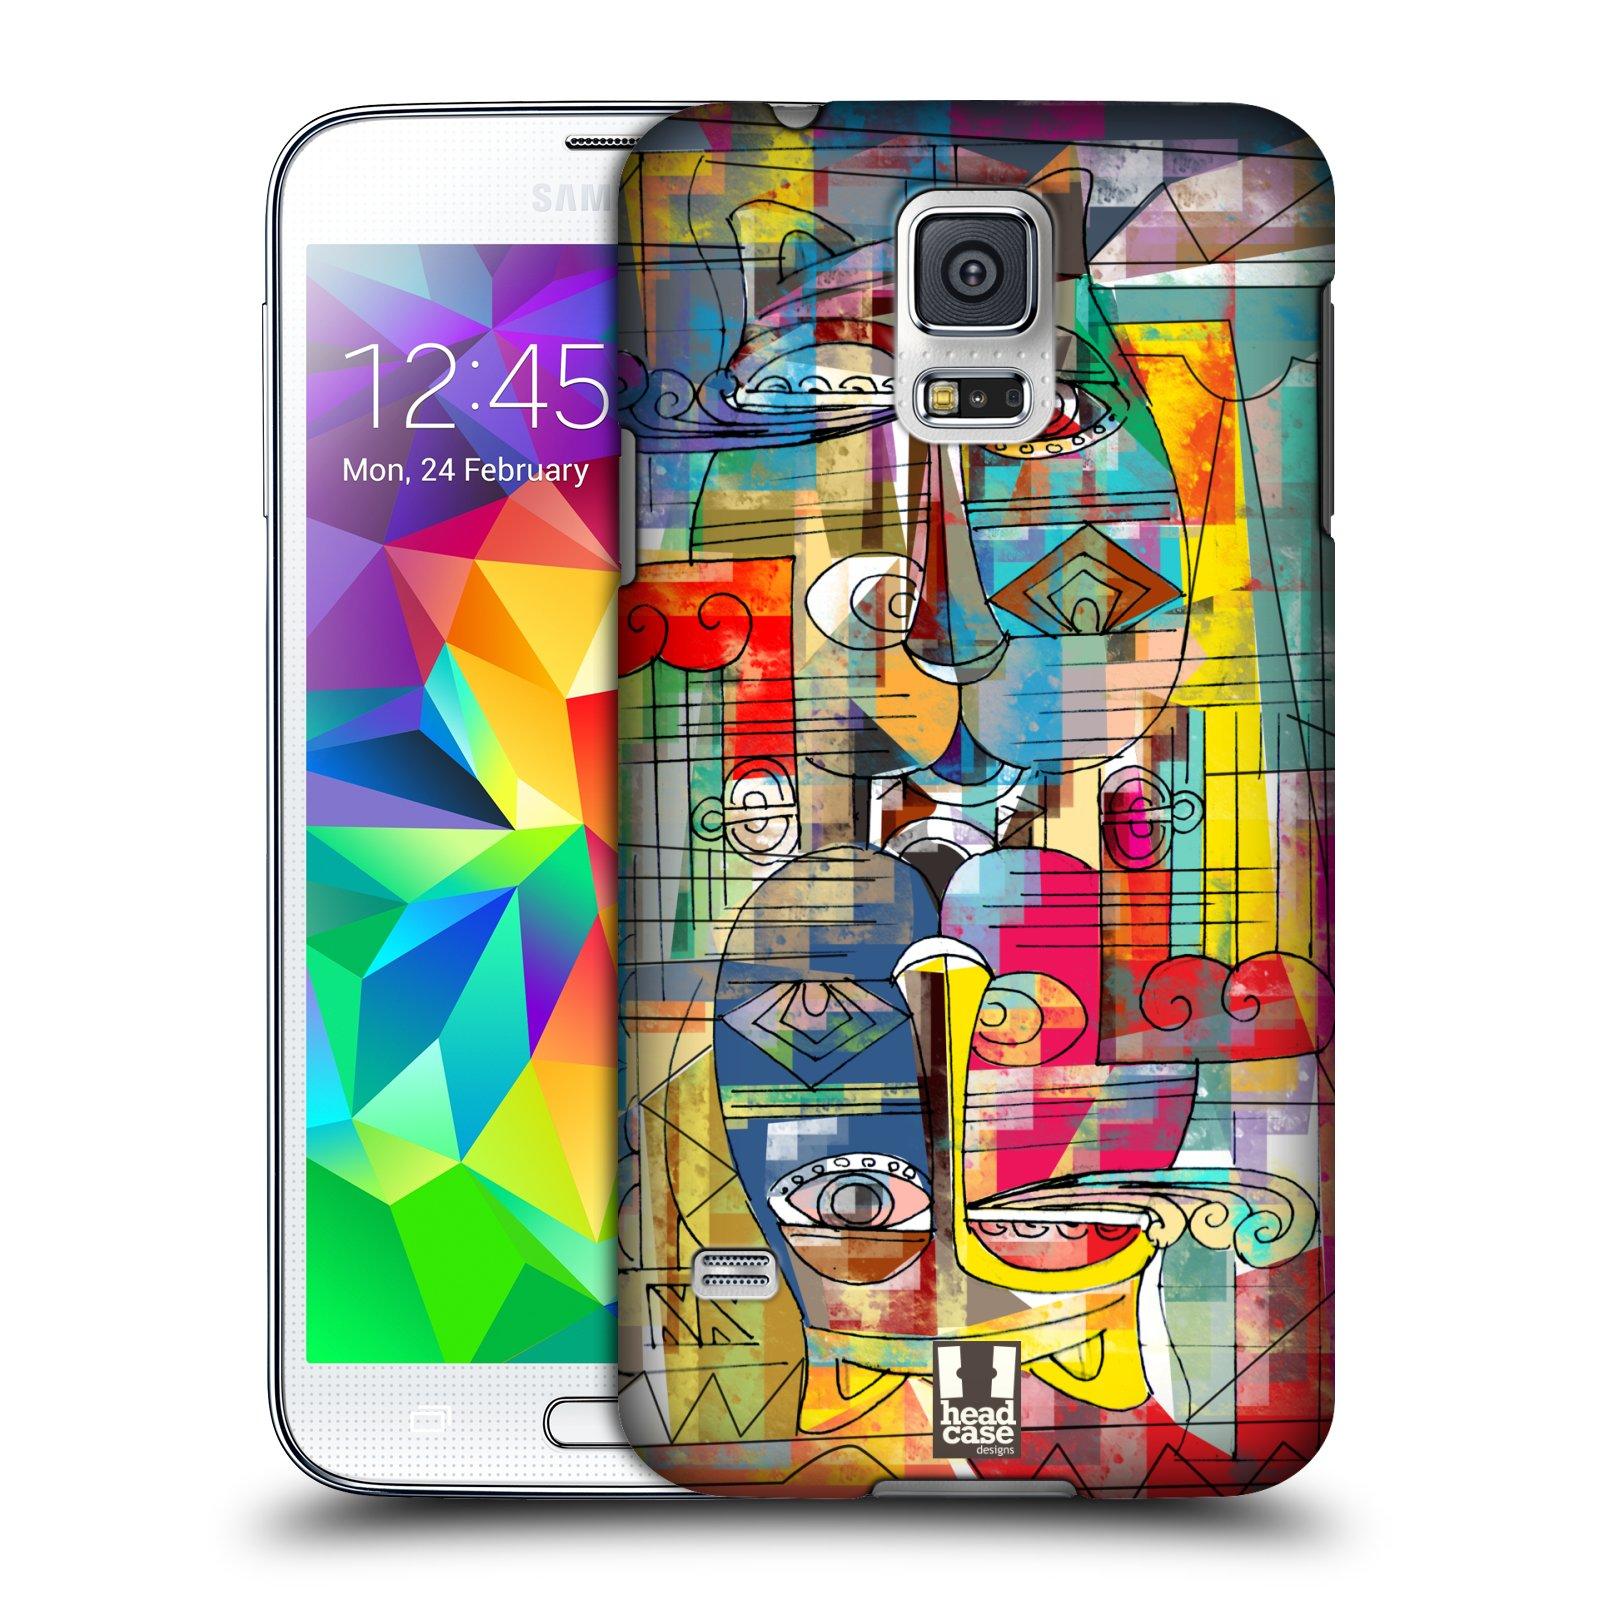 Plastové pouzdro na mobil Samsung Galaxy S5 HEAD CASE AZTEC MANX